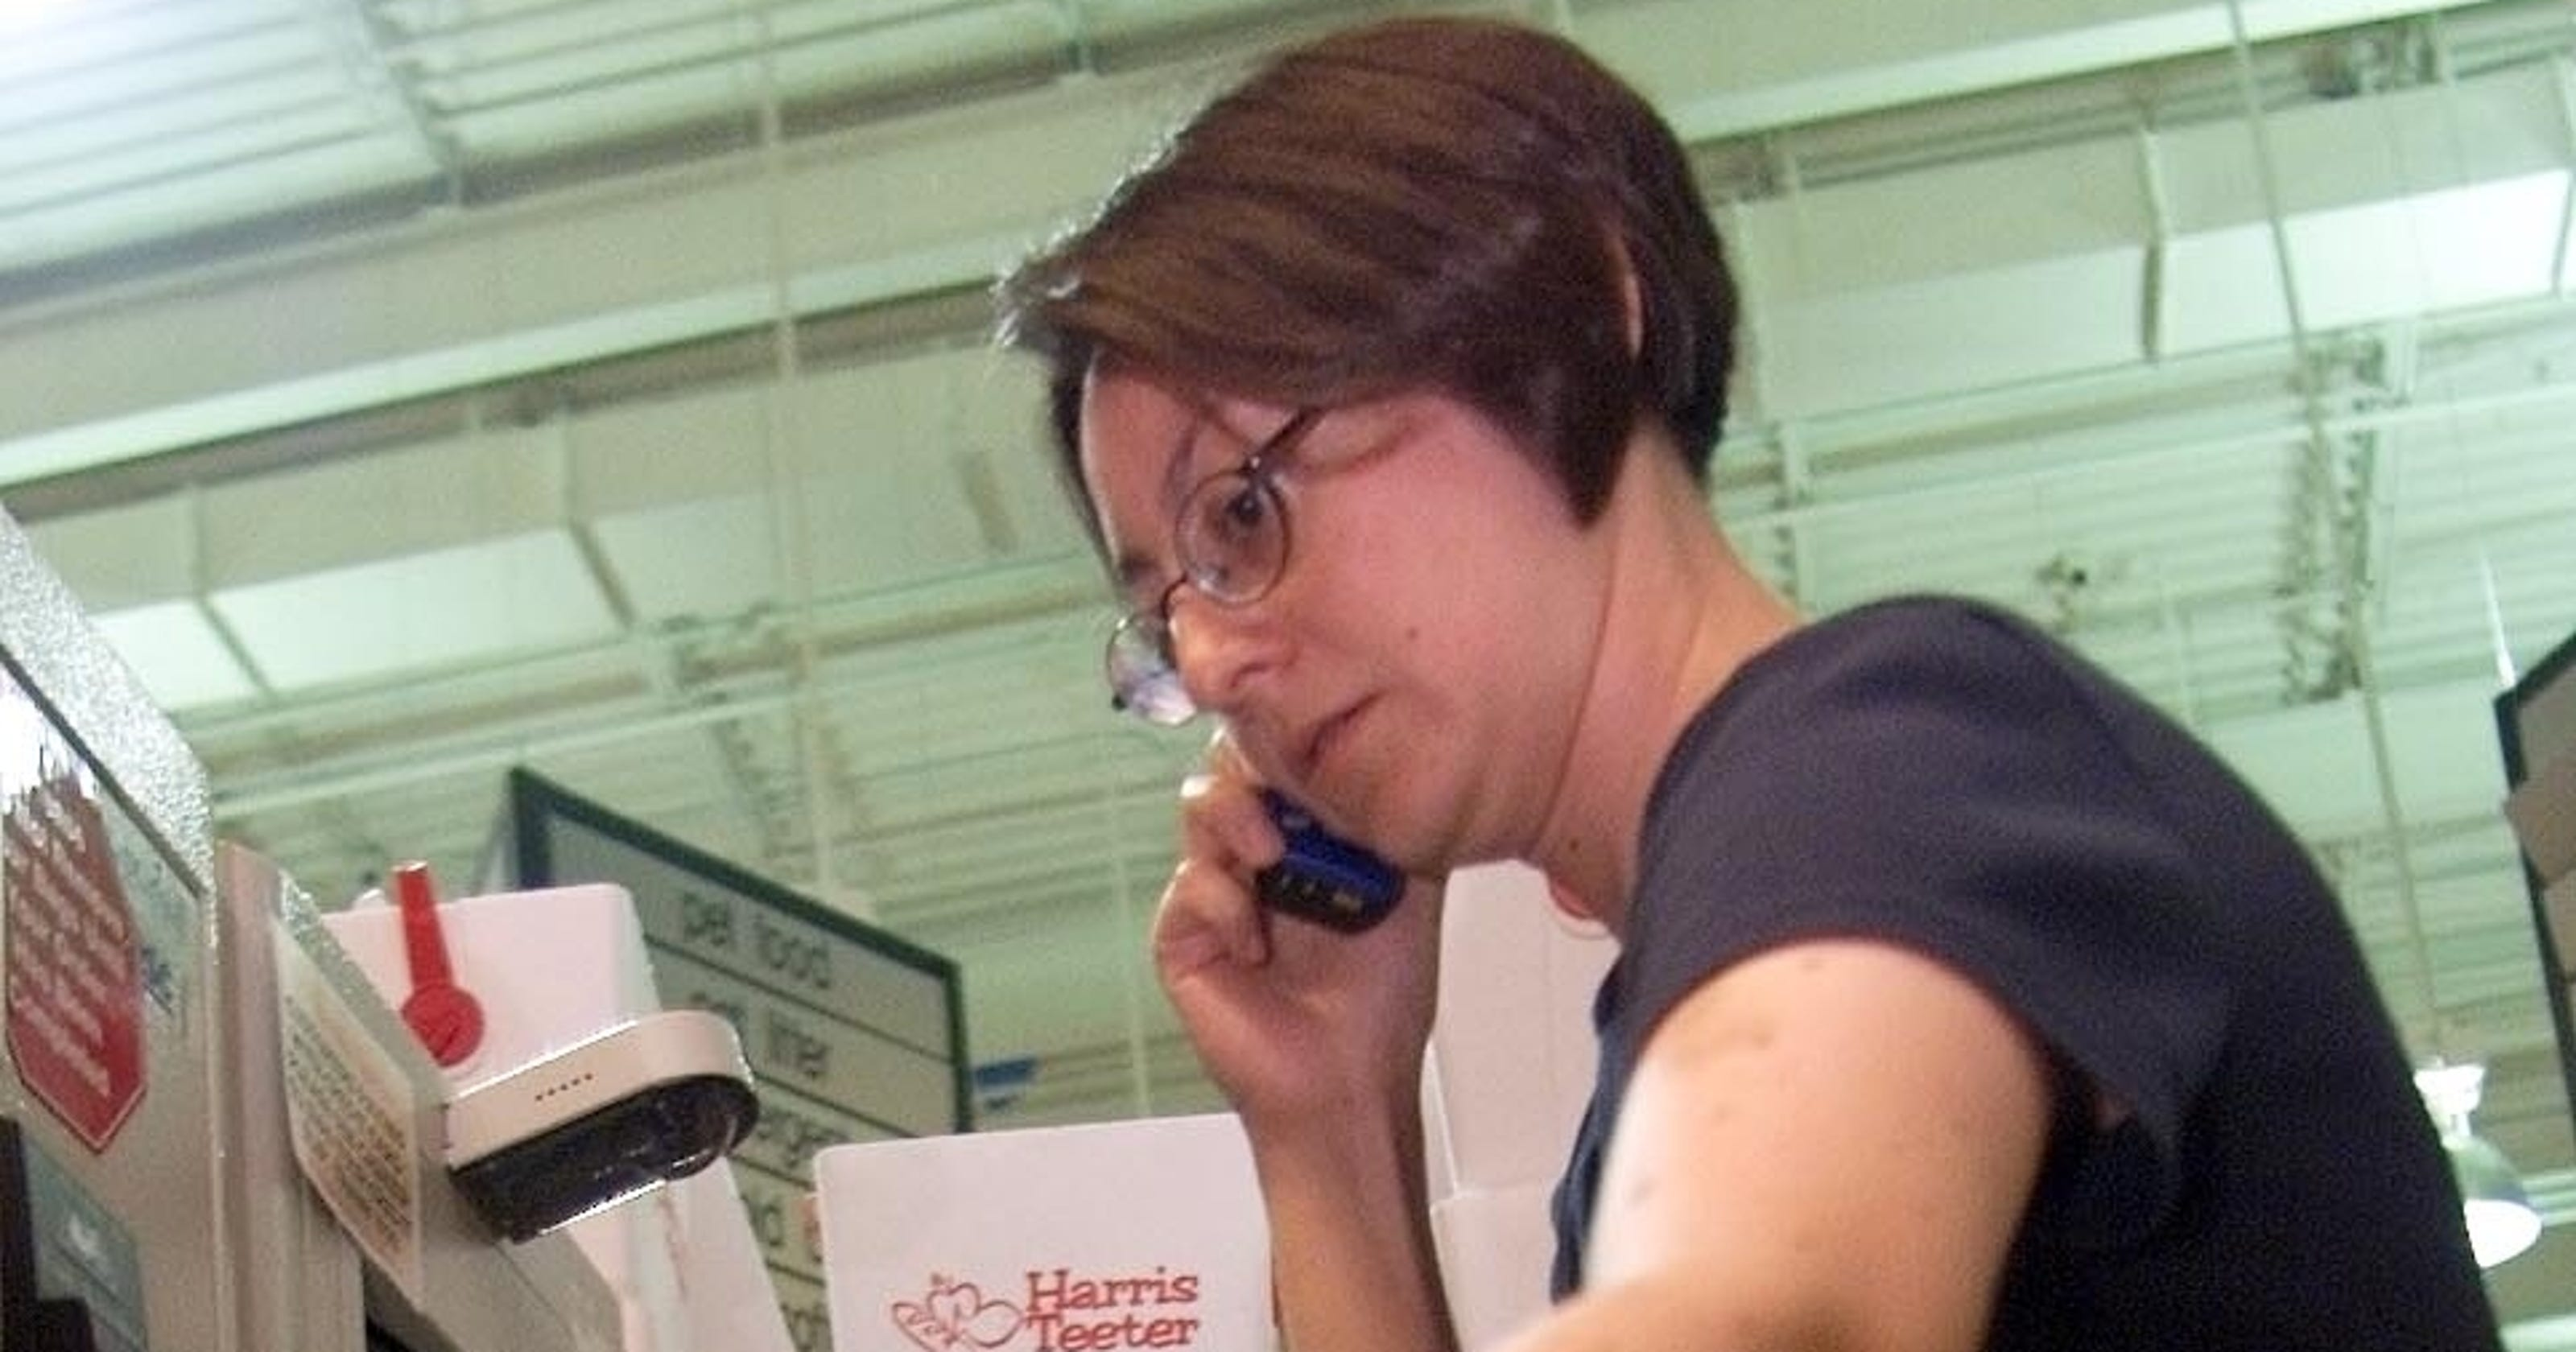 Kroger to buy Harris Teeter chain in $2 4B deal